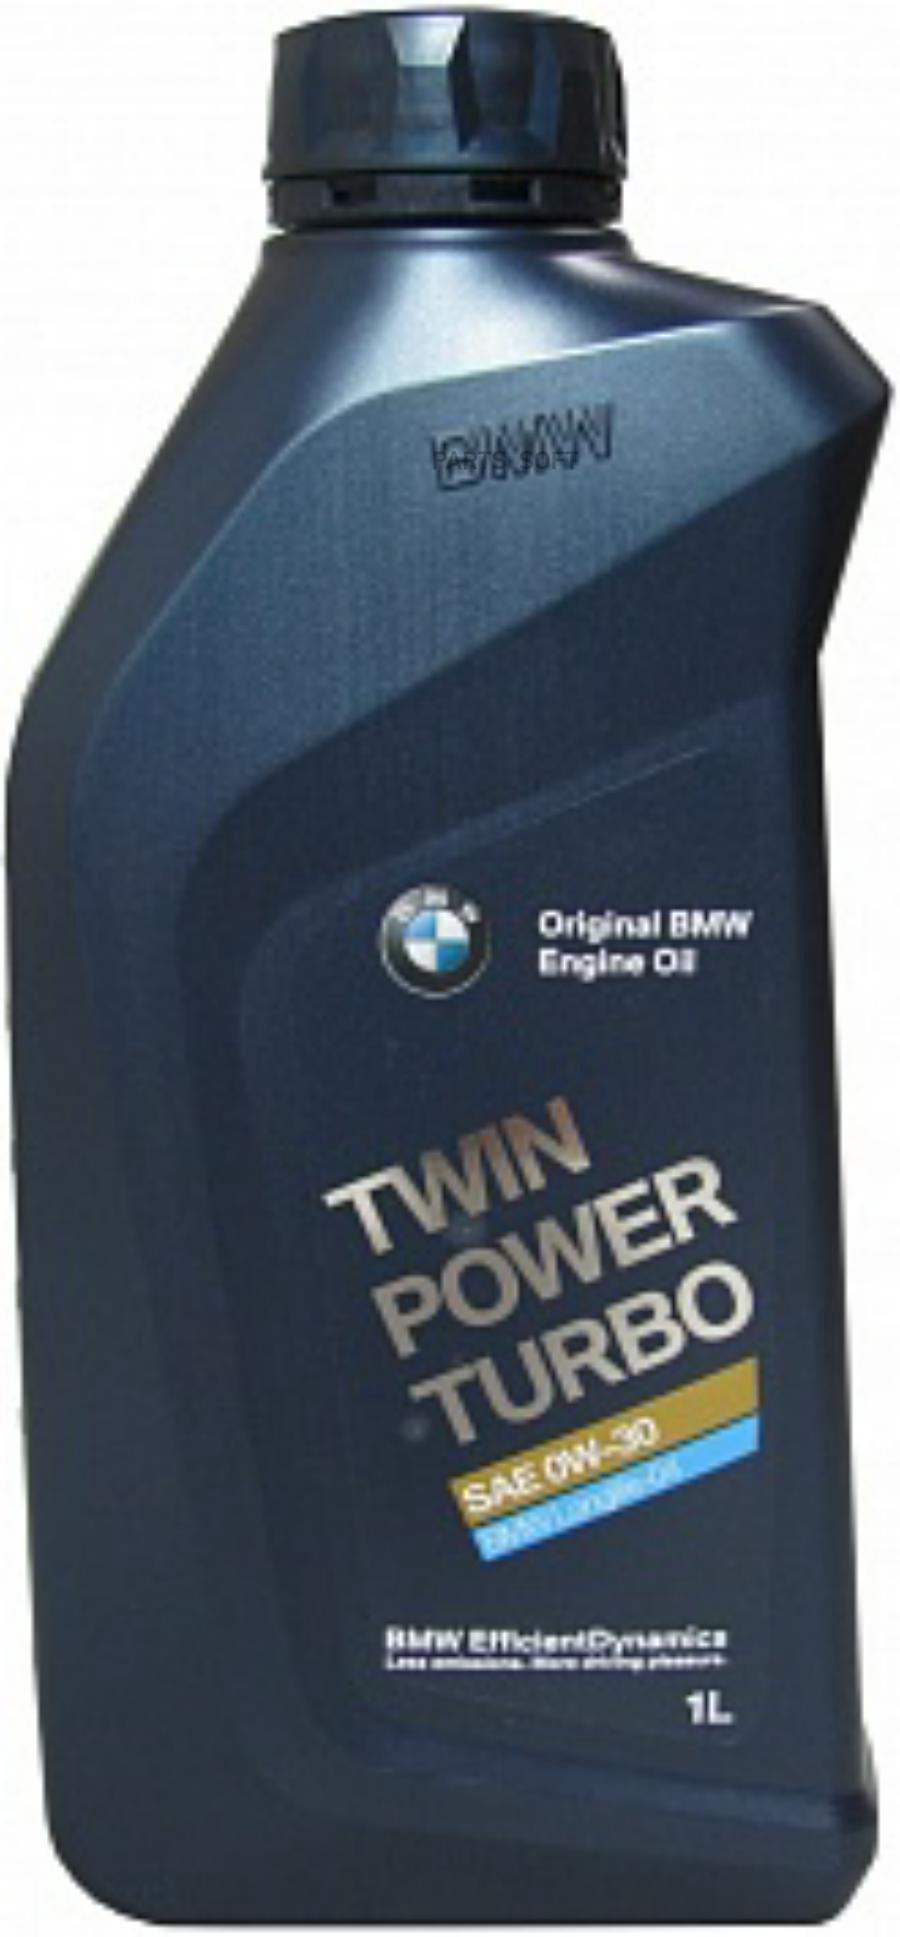 Масло моторное синтетическое Twin Power Turbo 0W-30, 1л